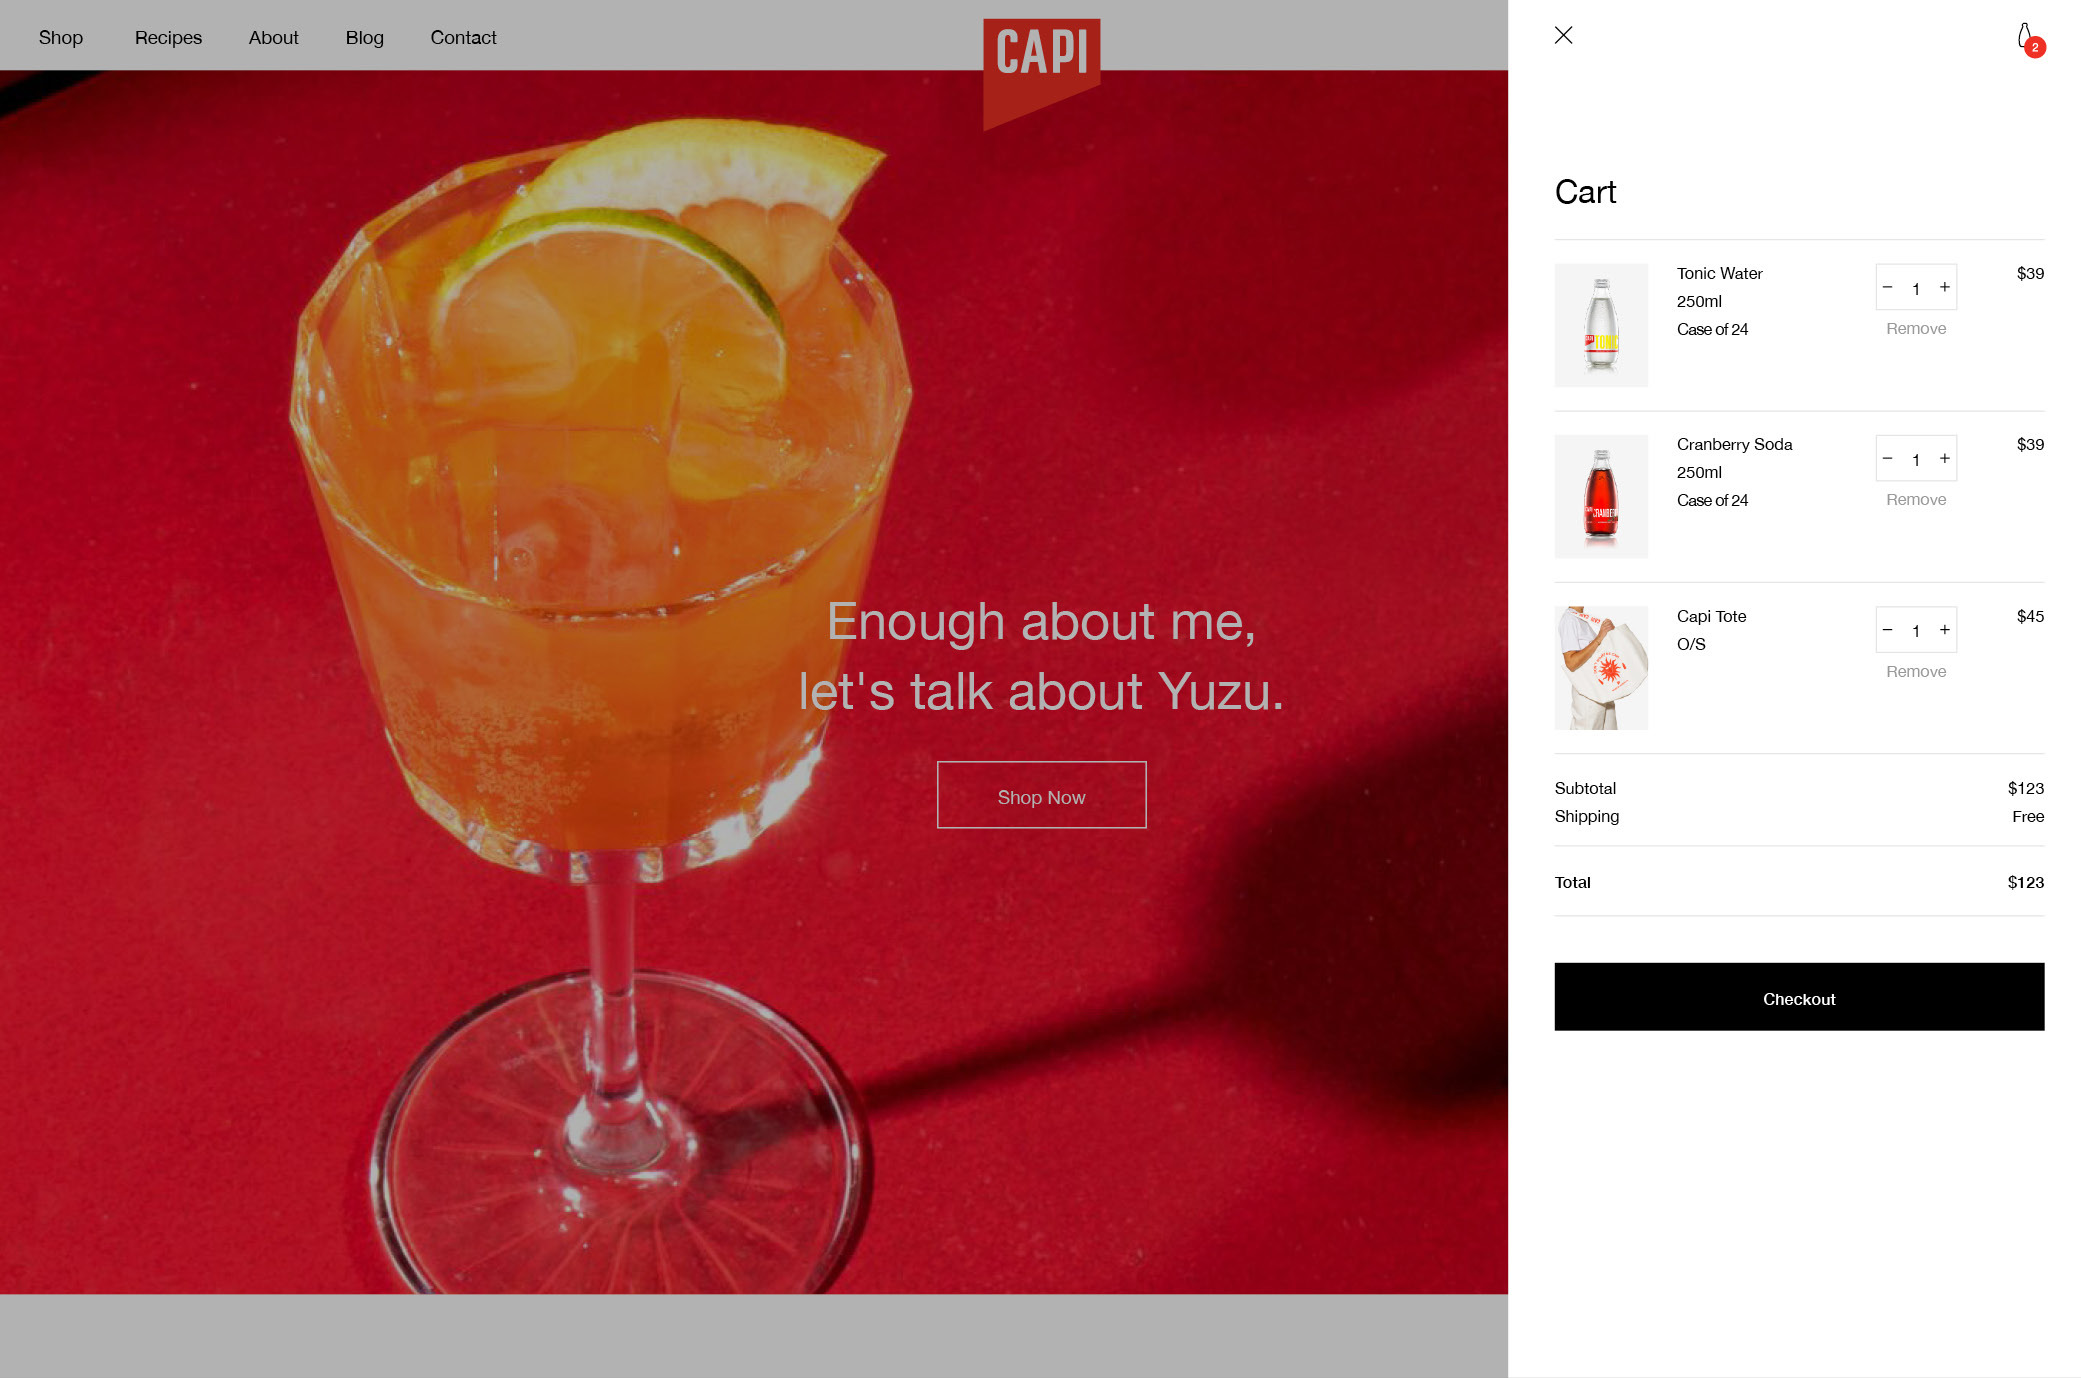 Capi Desktop Cart Side Tab